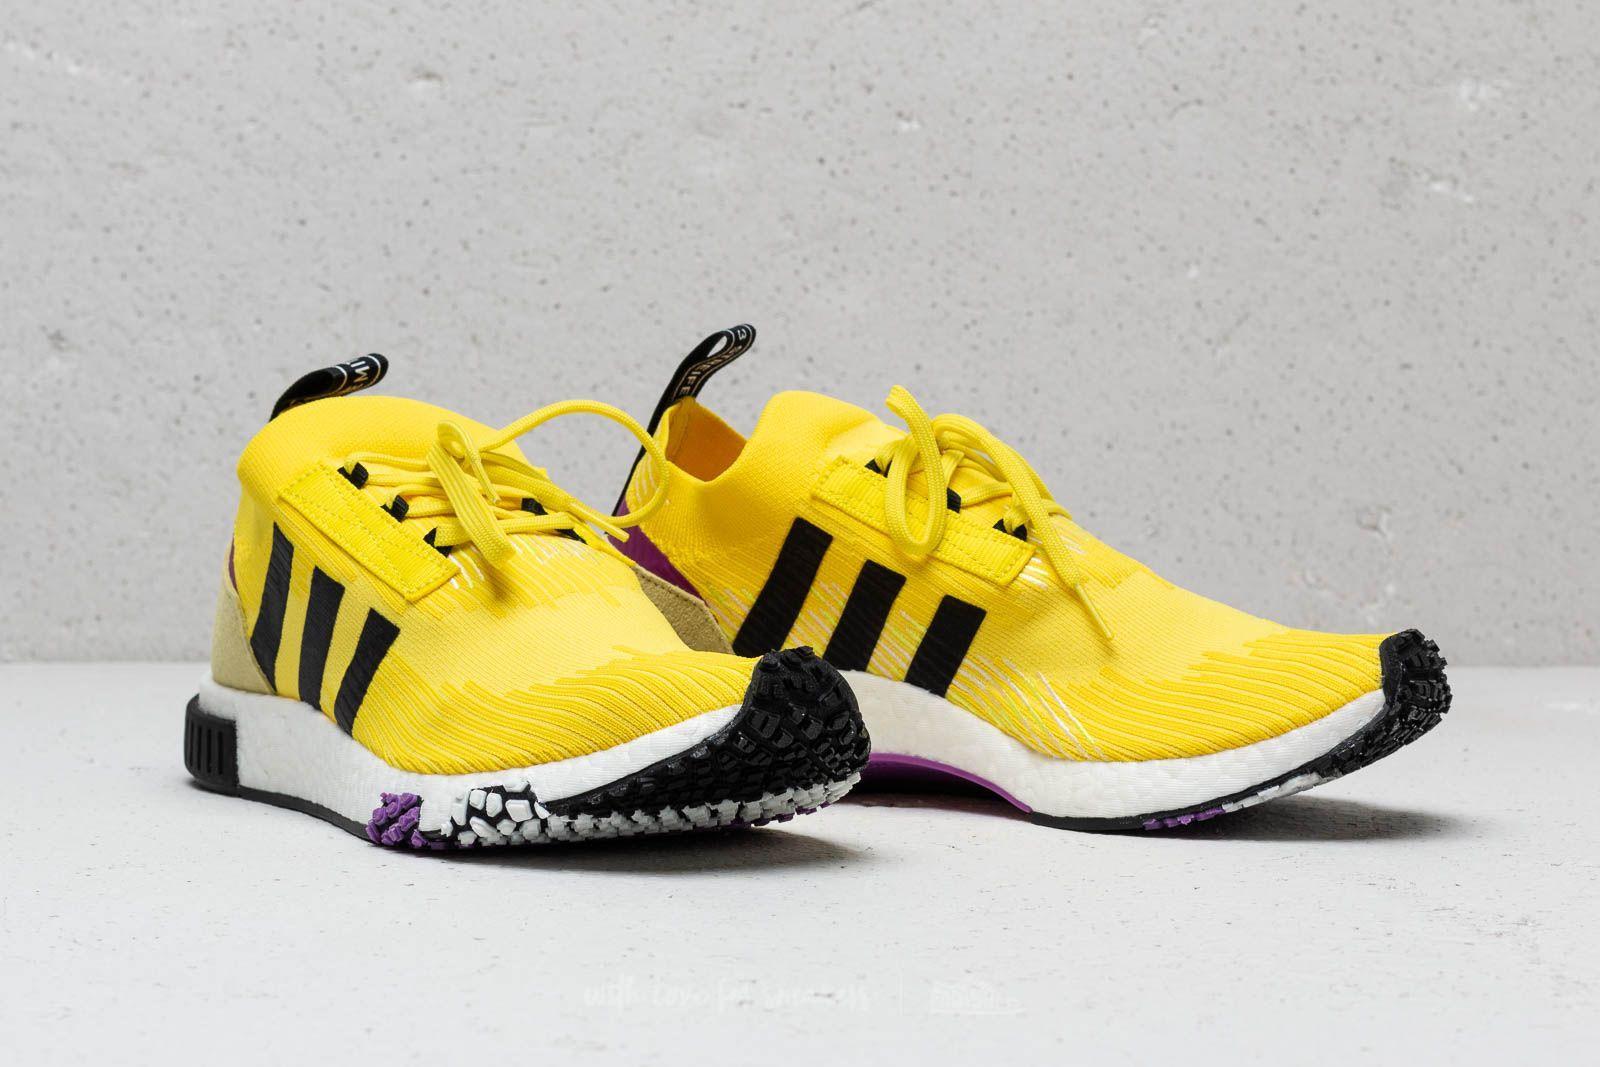 8d09866db4e41 Lyst - adidas Originals Adidas Nmd Racer Primeknit Solar Yellow ...